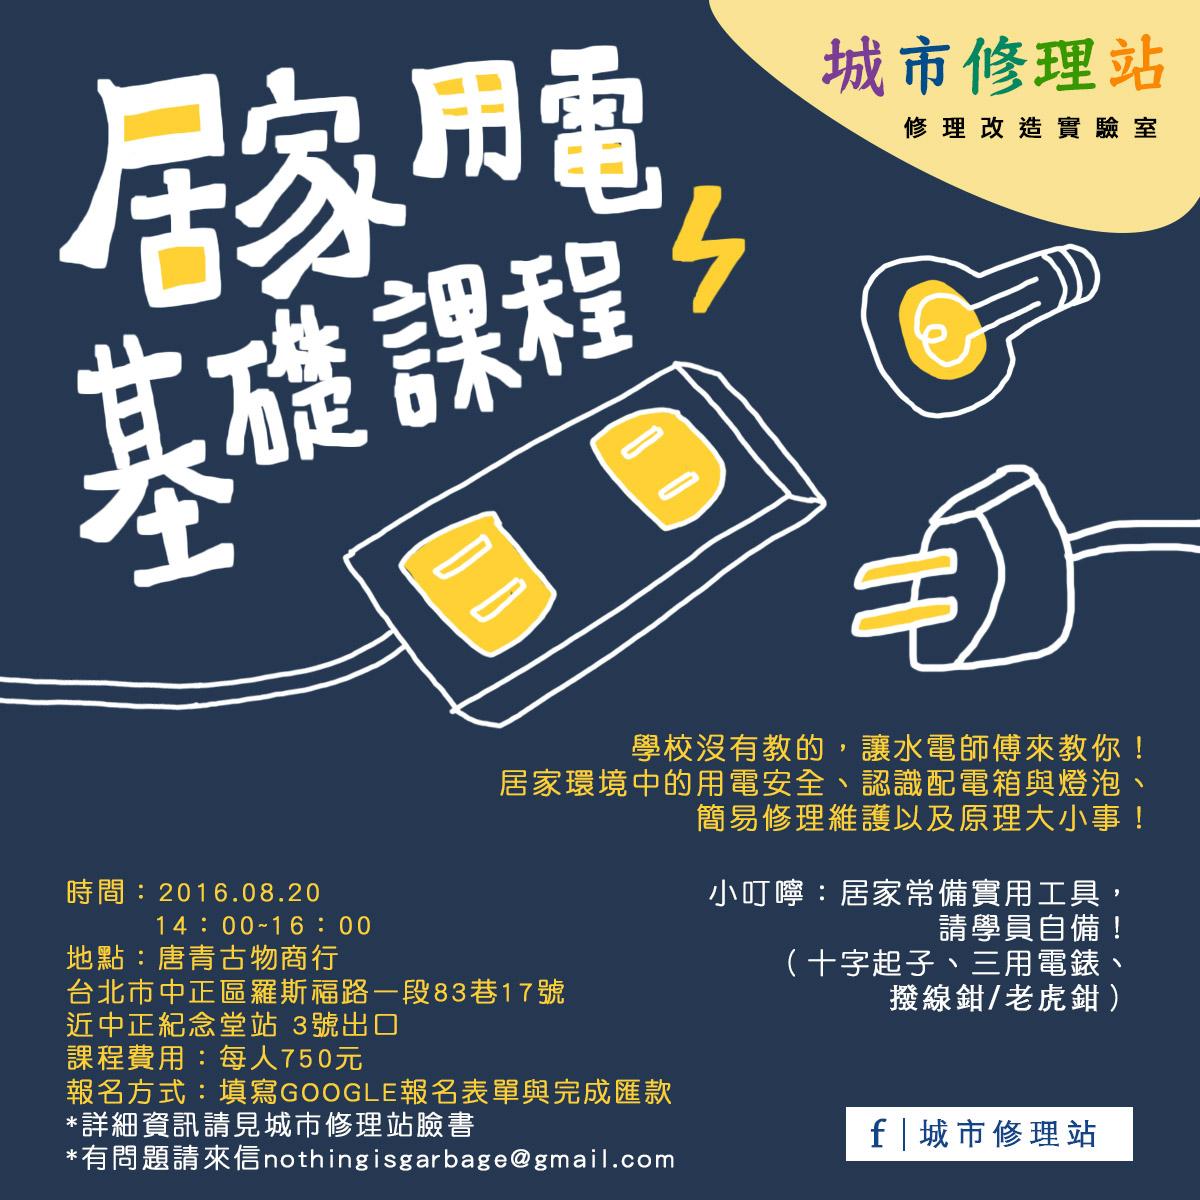 <課程>16.8.20居家用電課程